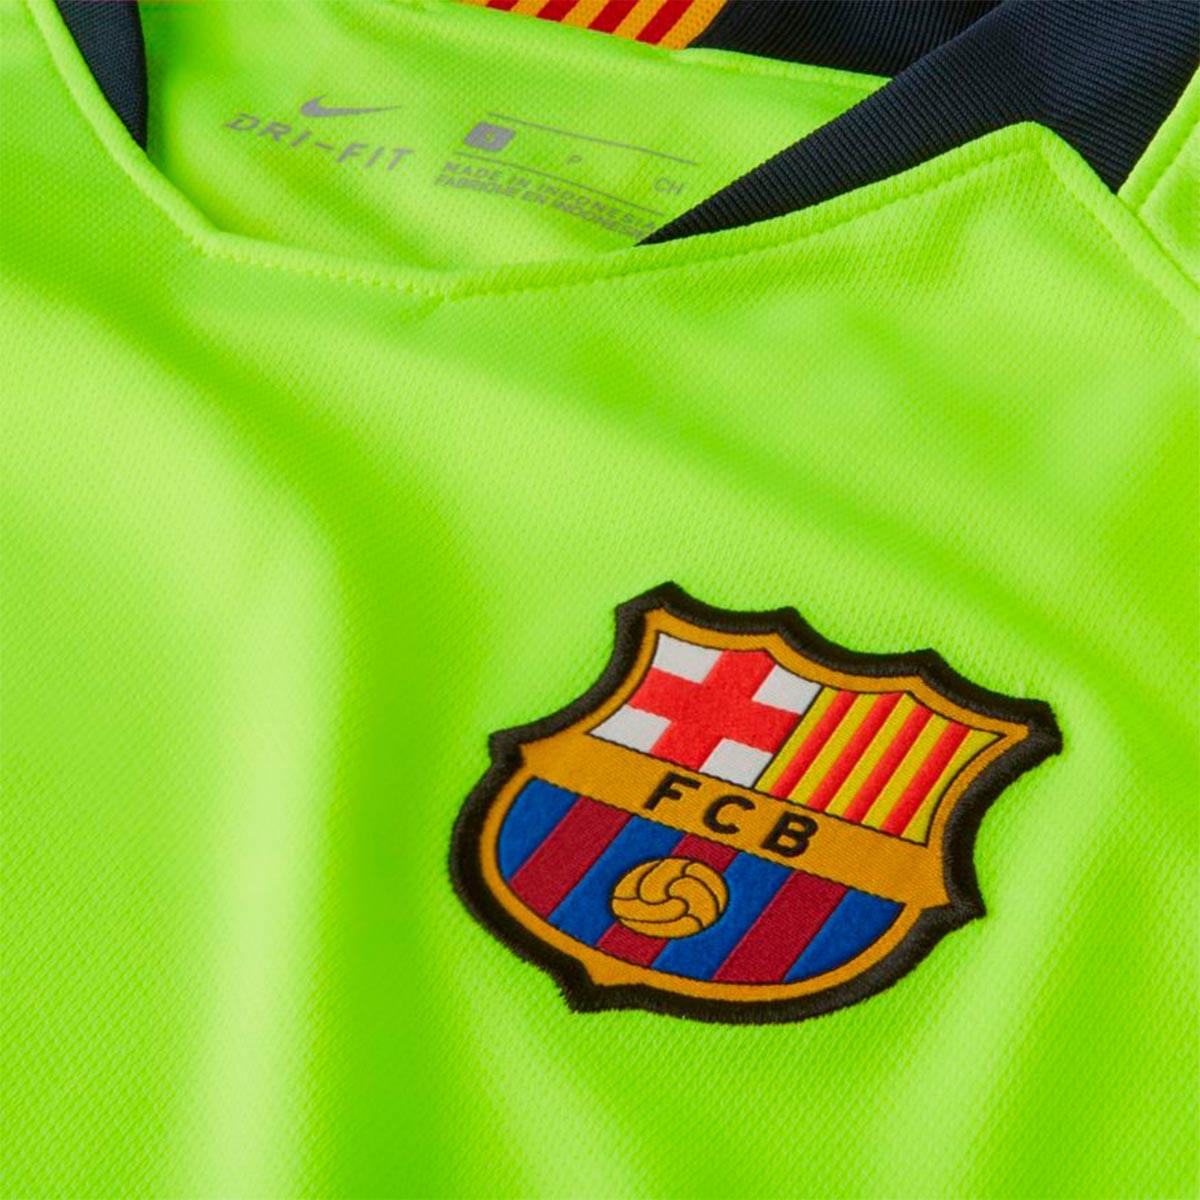 5dcaf74e84a04 Camiseta Nike FC Barcelona Stadium Segunda Equipación 2018-2019 Mujer  Volt-Deep royal blue - Tienda de fútbol Fútbol Emotion